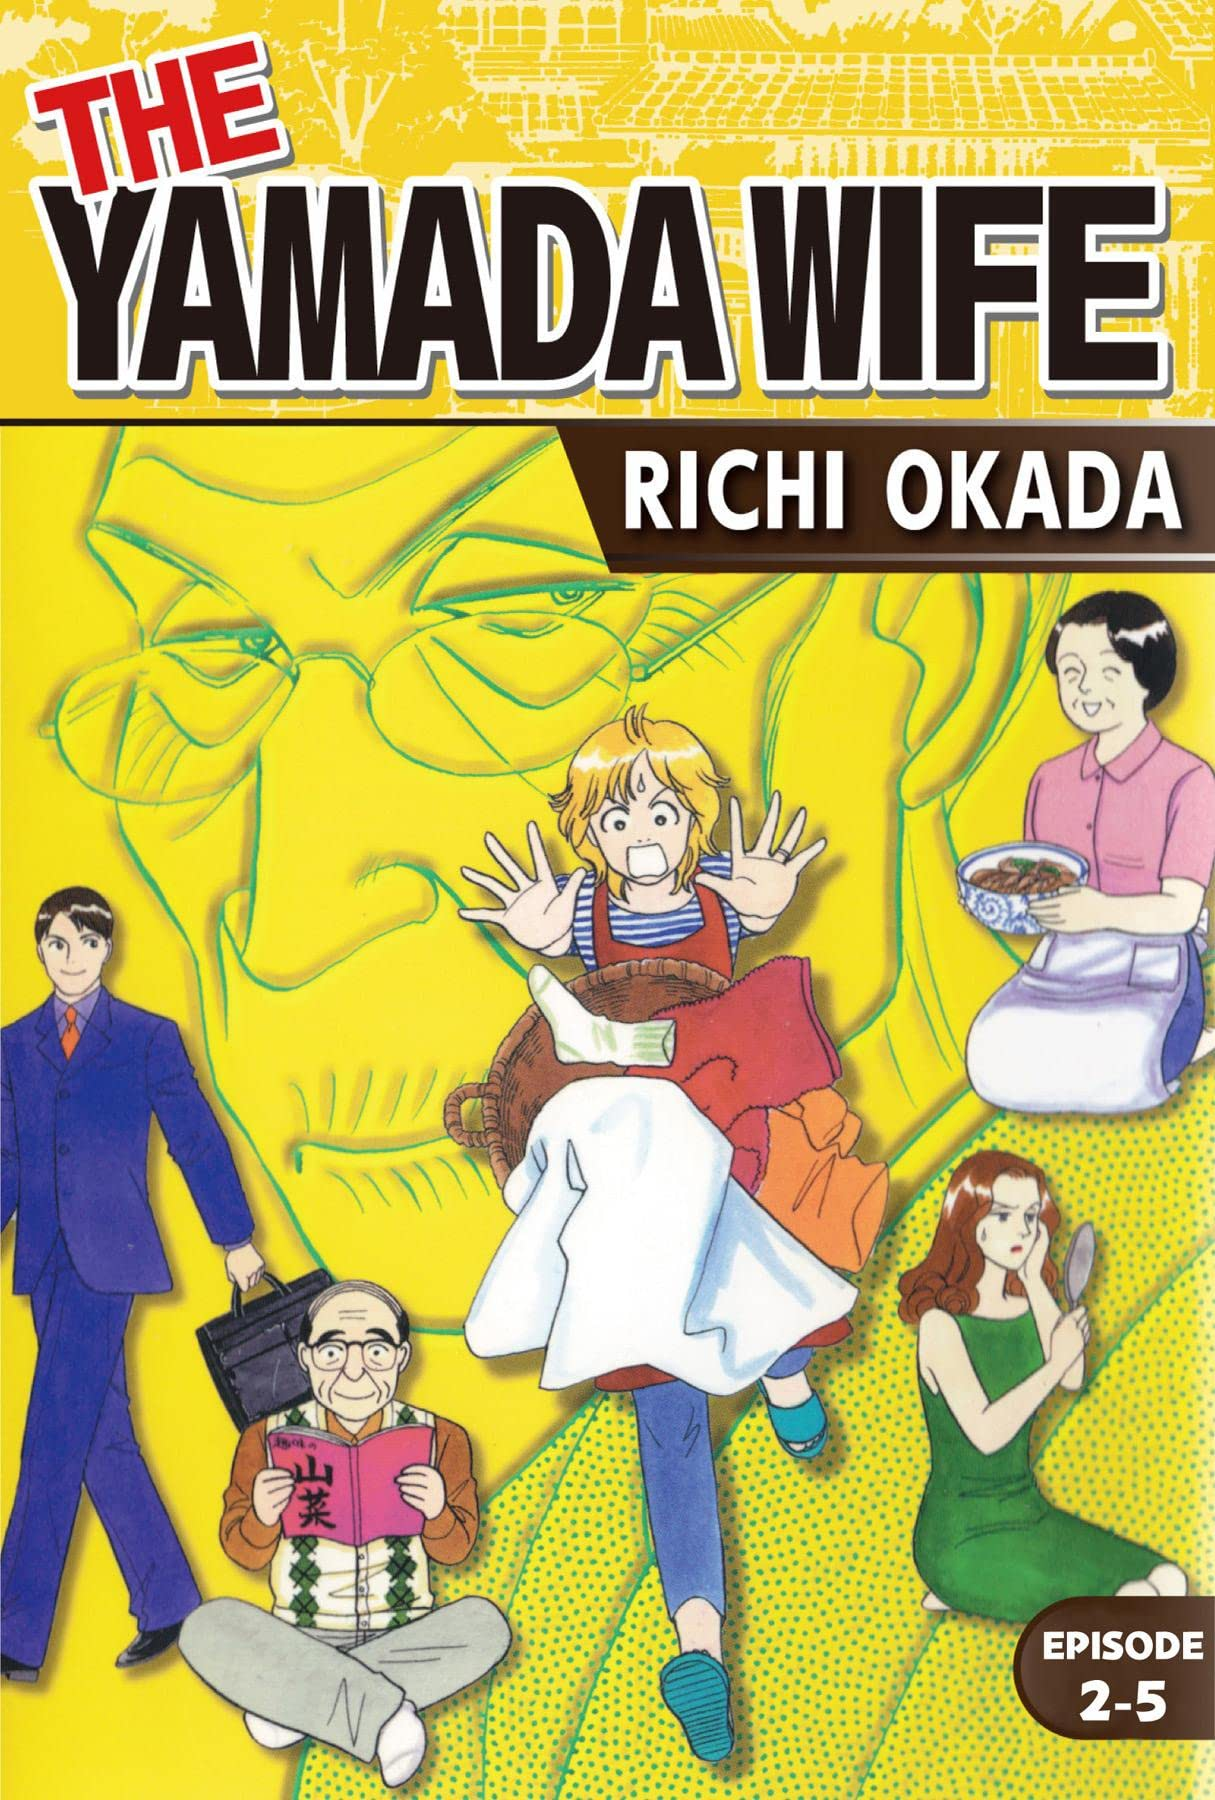 THE YAMADA WIFE #12